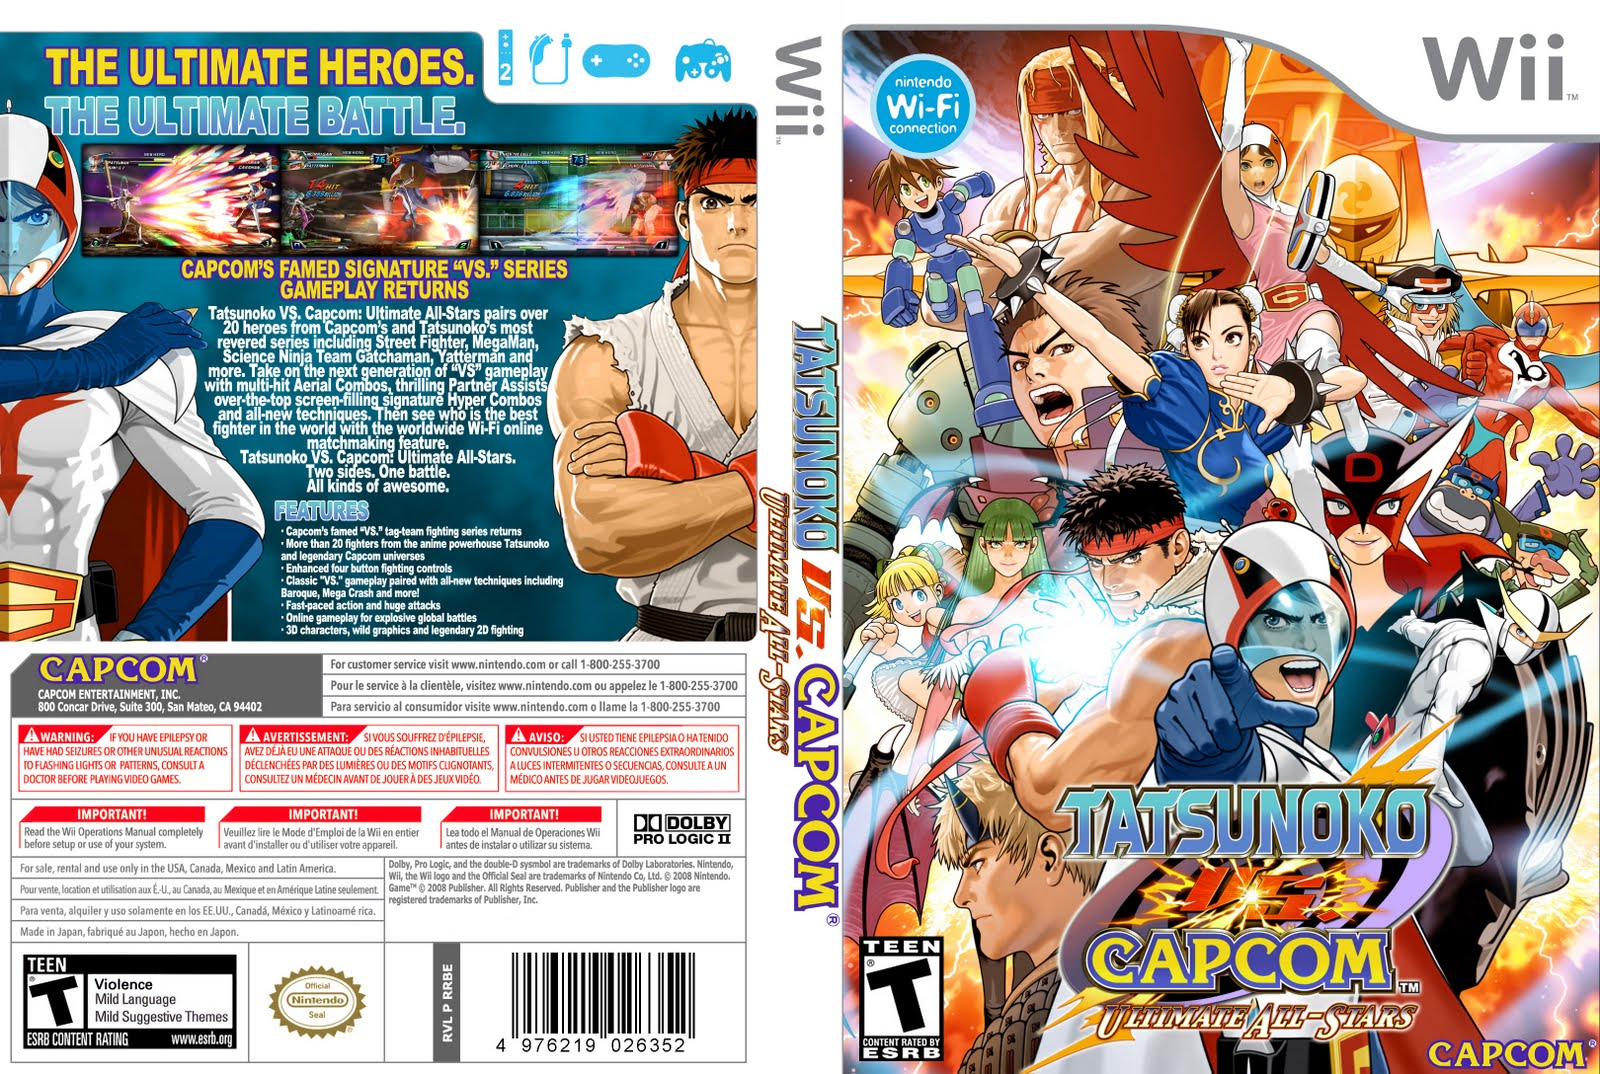 Games de Wii convertidos para Wii U  Tatsunoko%2BVS%2BCapcom%2BUltimate%2BAll-Stars%2B-%2Bwii